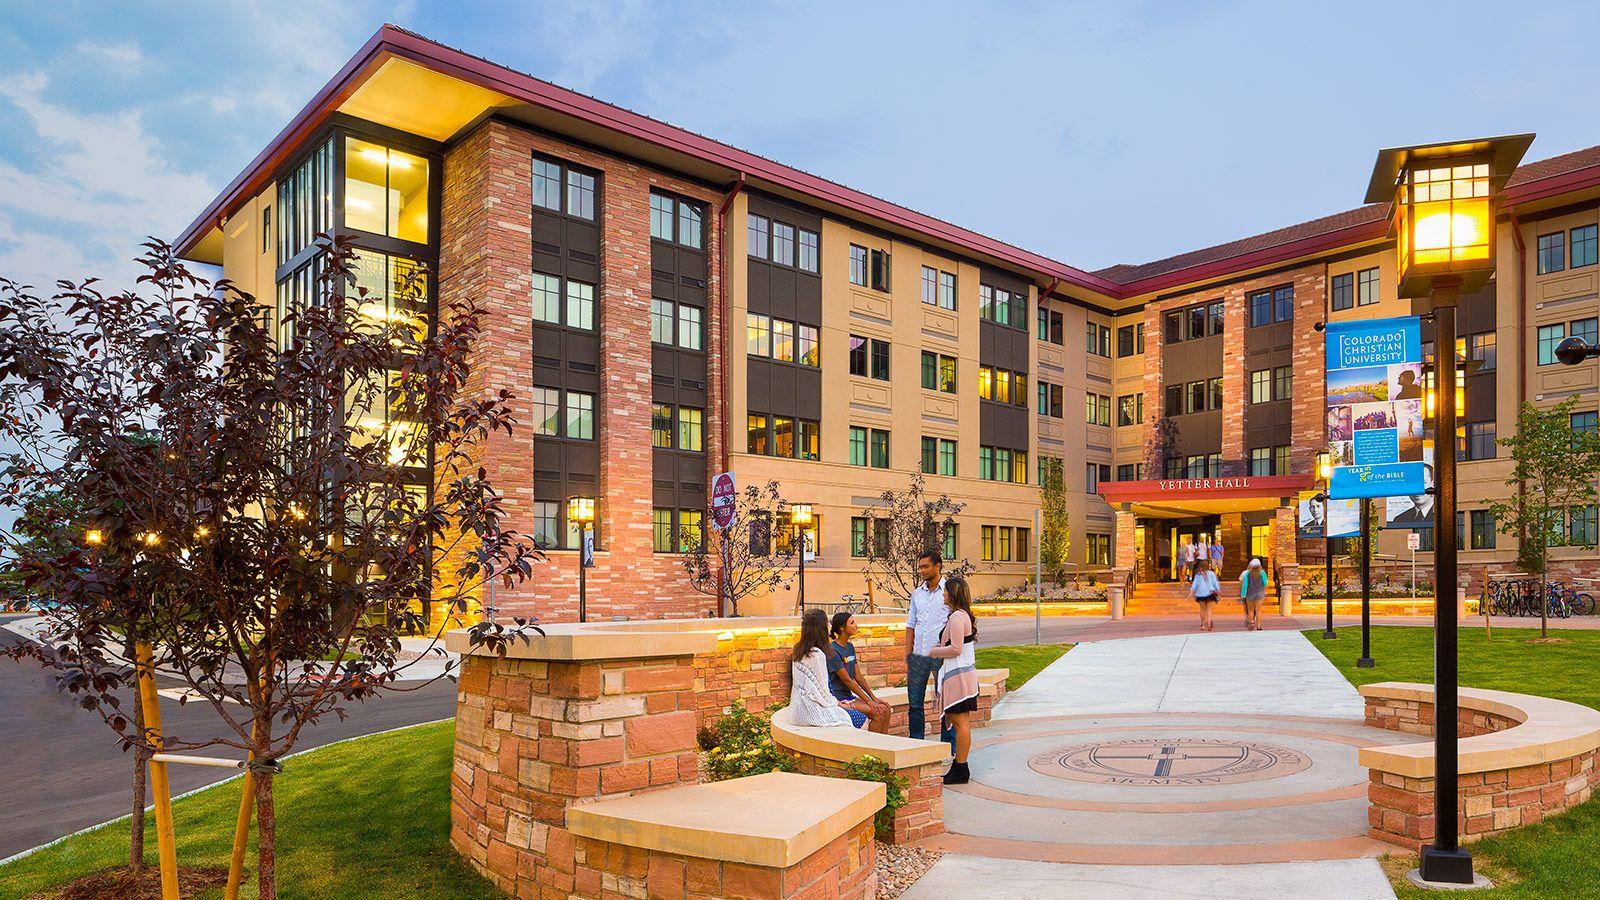 10 Of The Hardest Classes At Coastal Carolina University Coastal Carolina University Coastal Carolina Colorado College